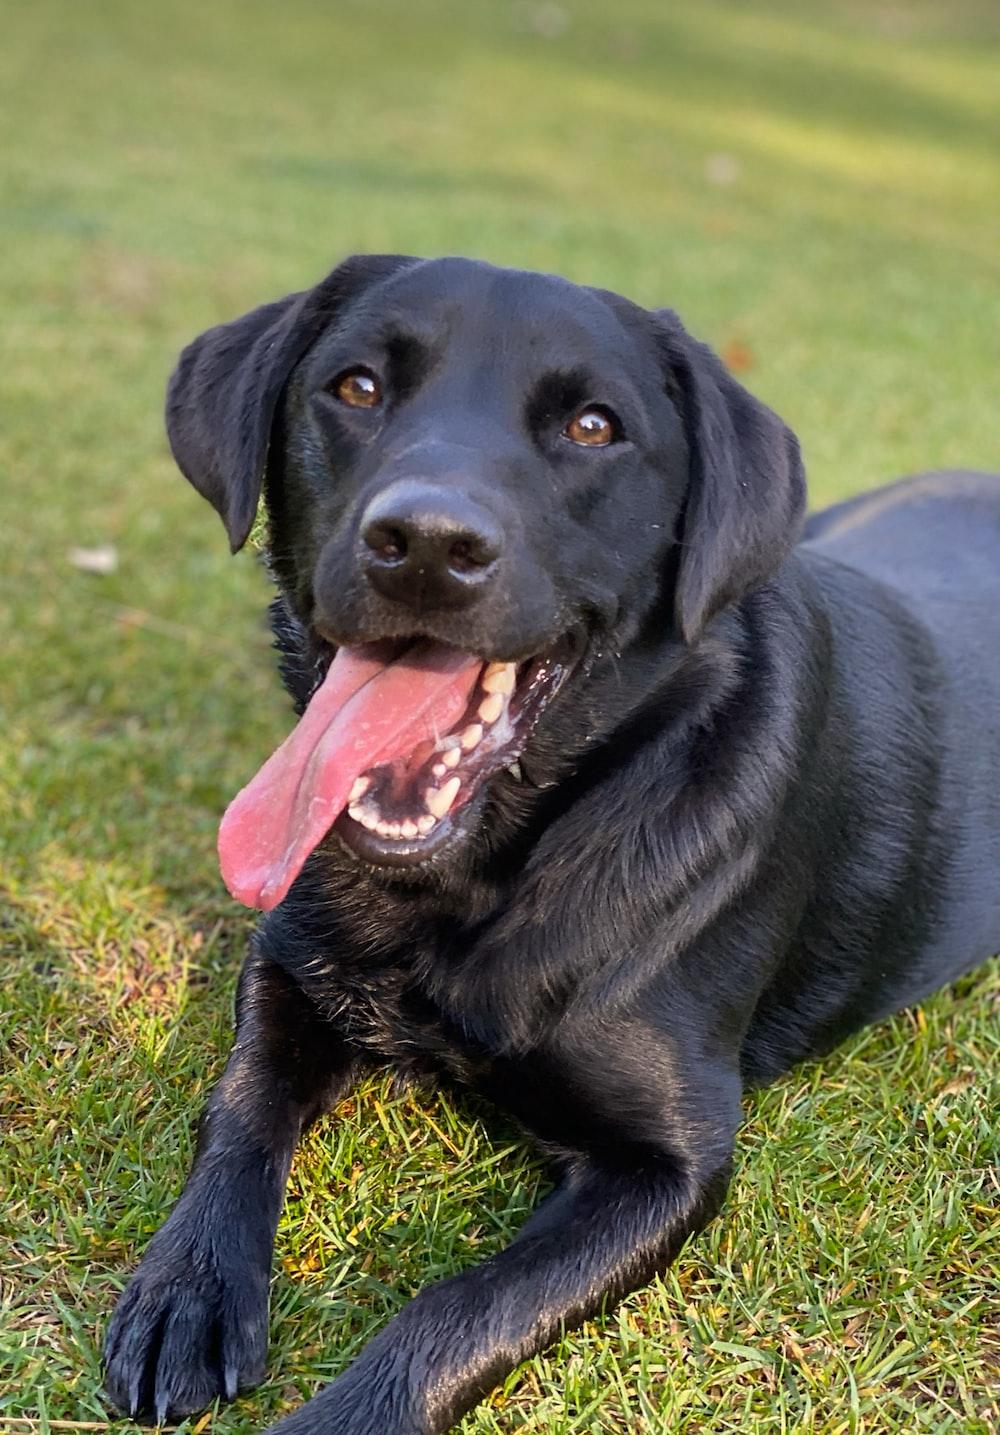 black dog lying on green grass